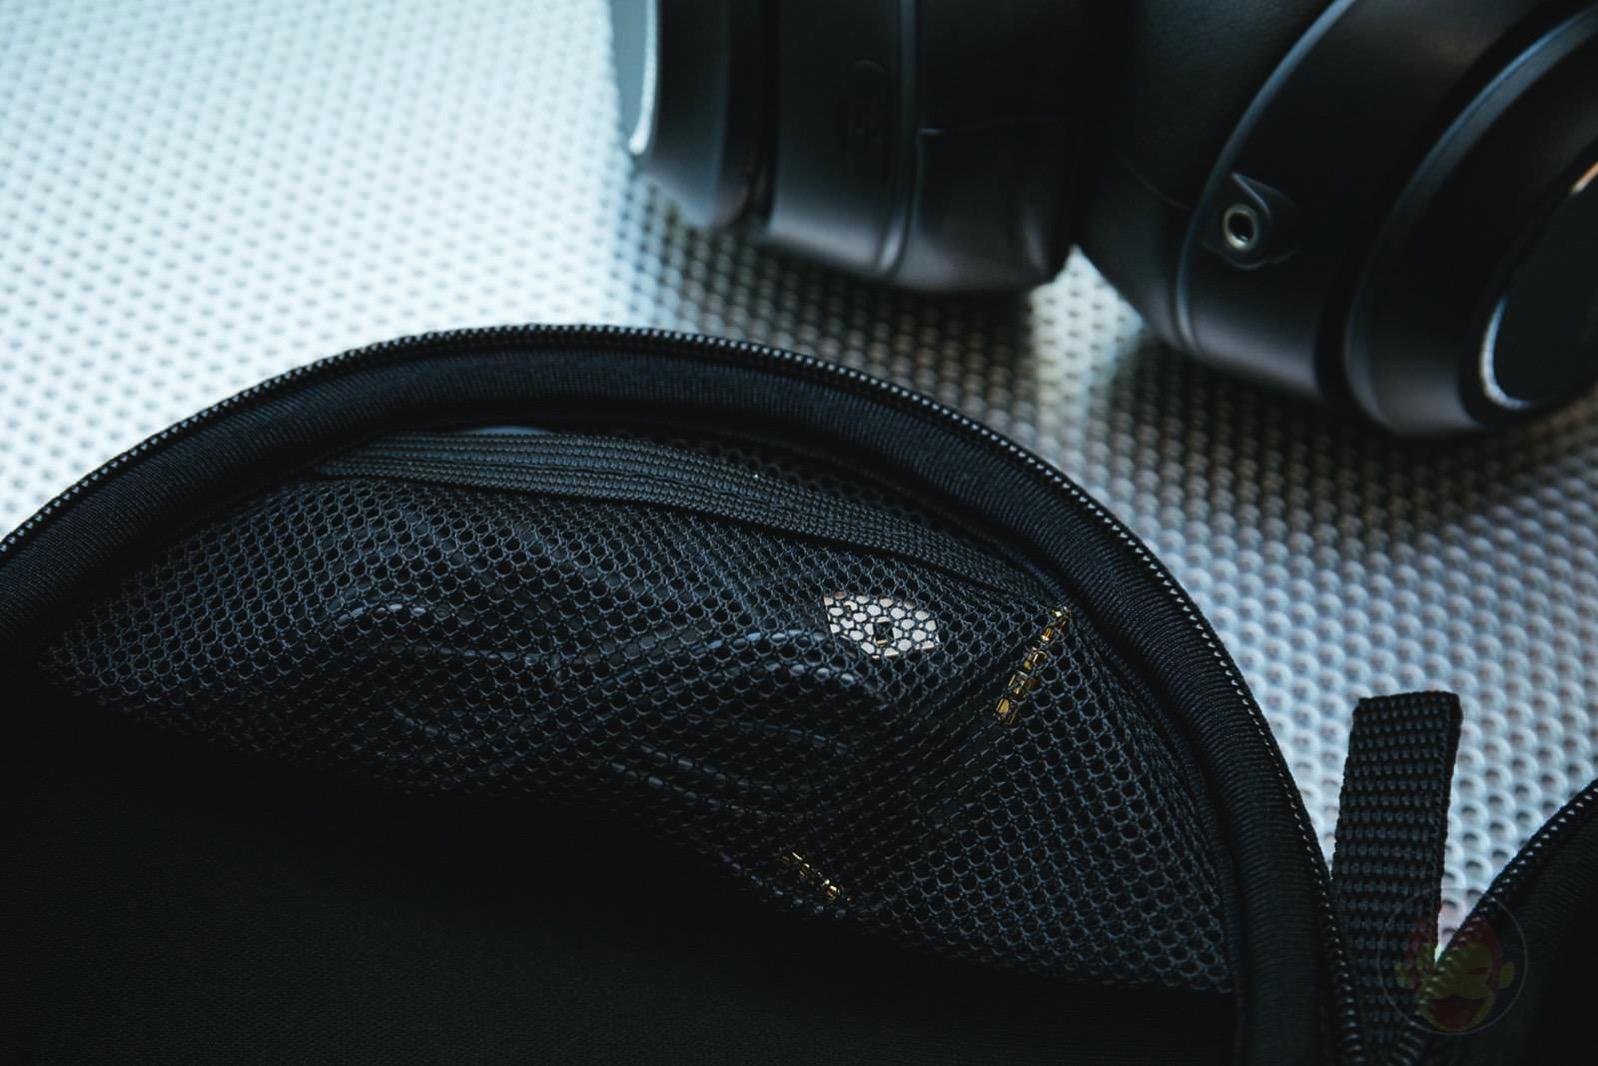 Soundcore-Vortex-Wireless-Headphones-04.jpg